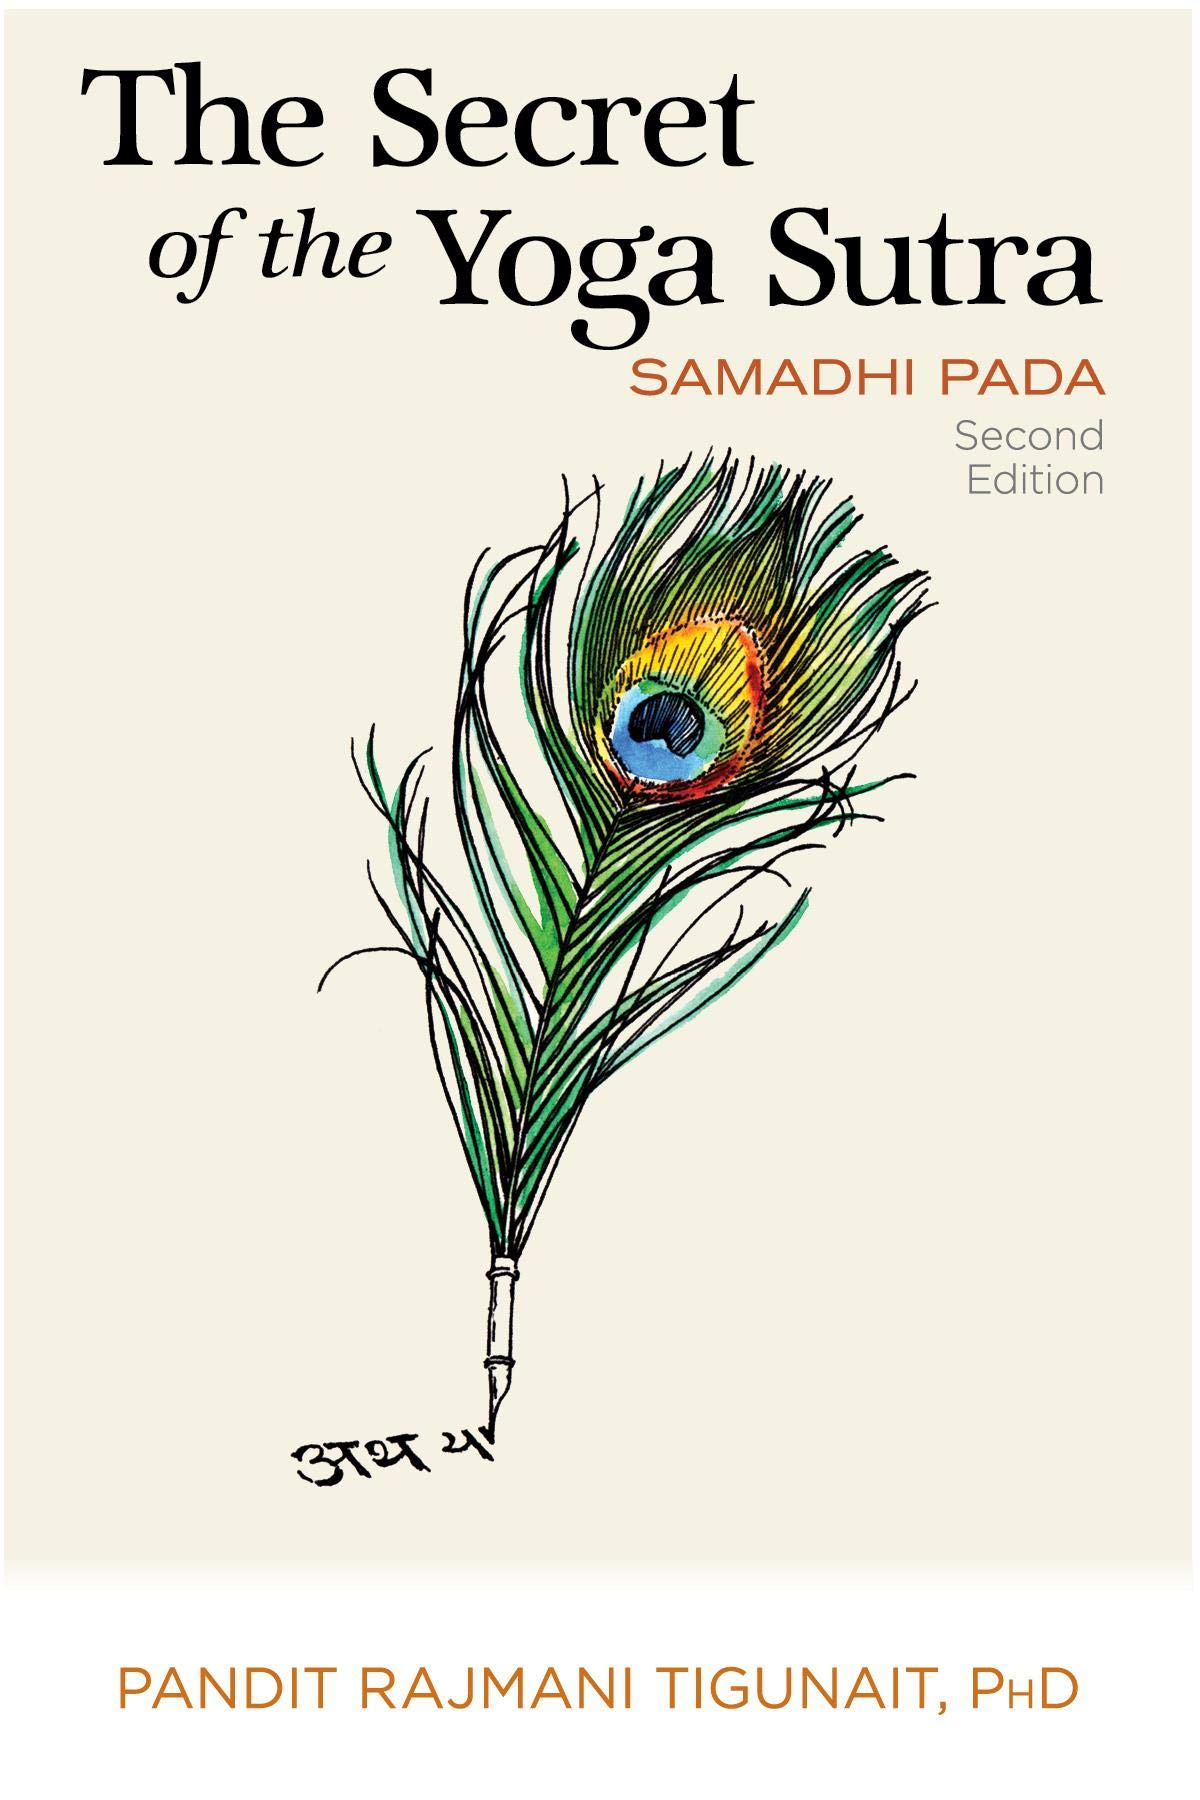 The Secret of the Yoga Sutra: Samadhi Pada ebook